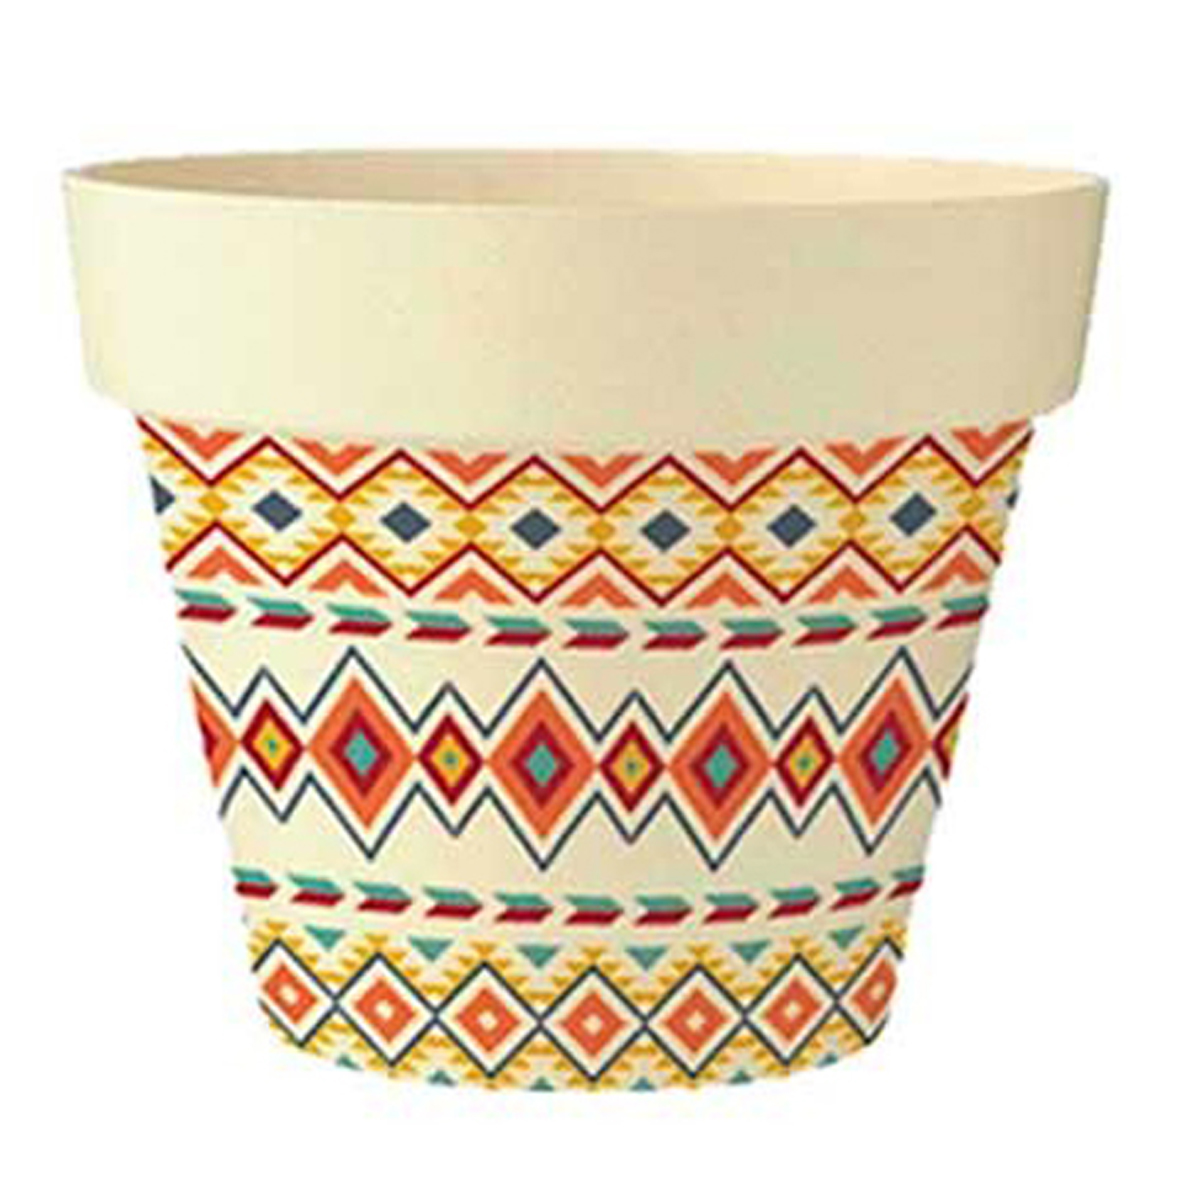 Cache-pot bambou \'Boho\' orange multicolore beige -  135x15 cm - [Q6429]